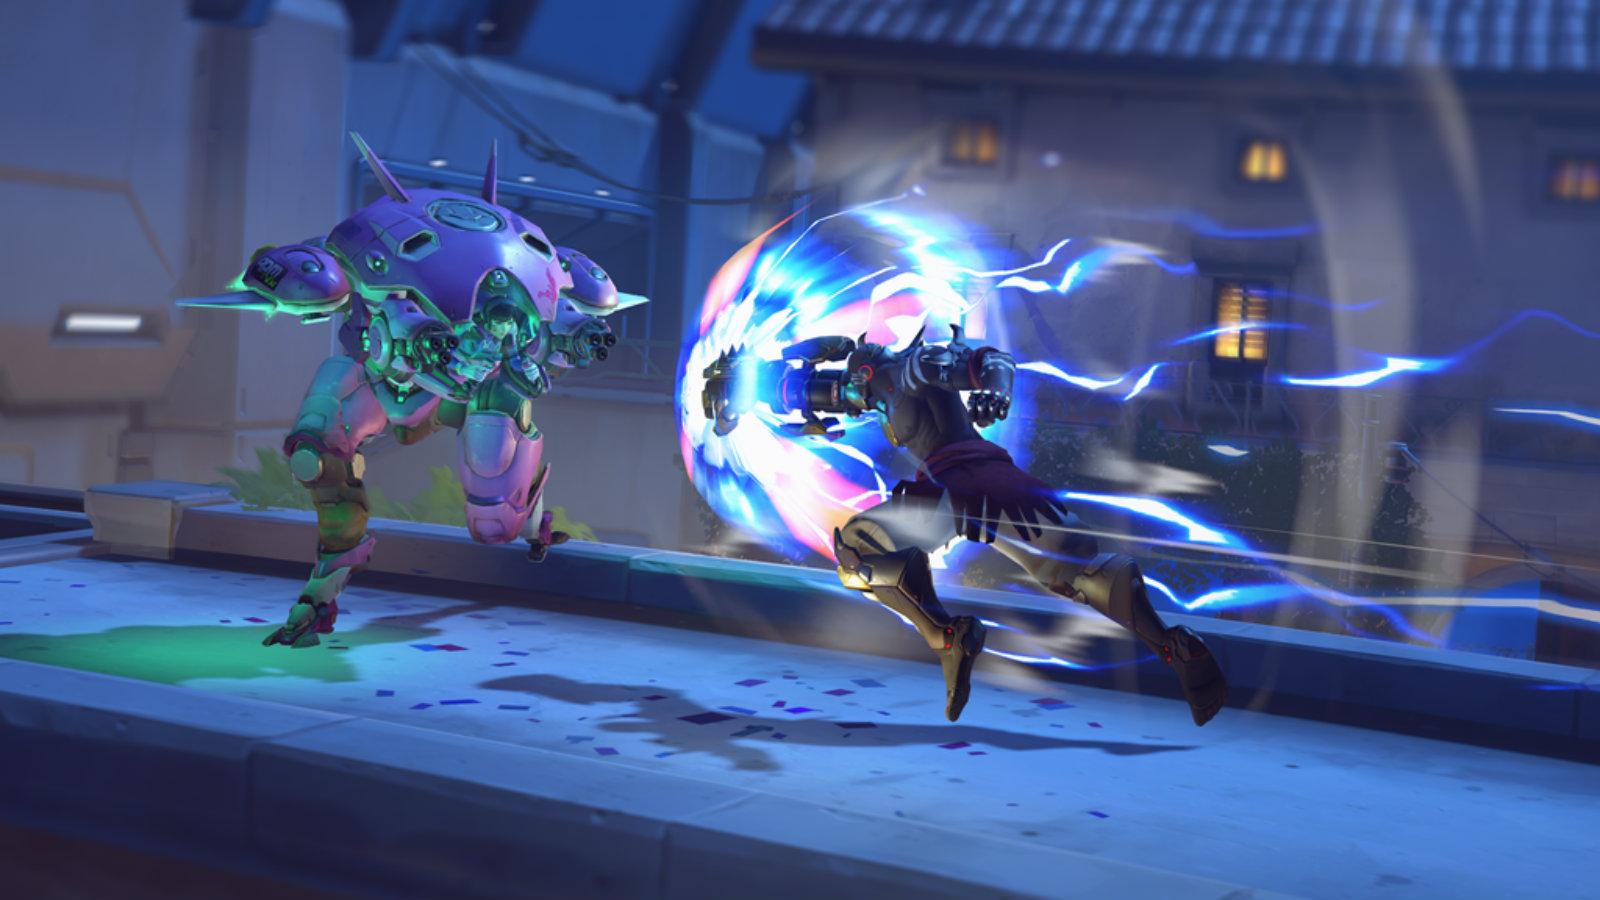 Doomfist rocket punches Dva on Dorado in Overwatch